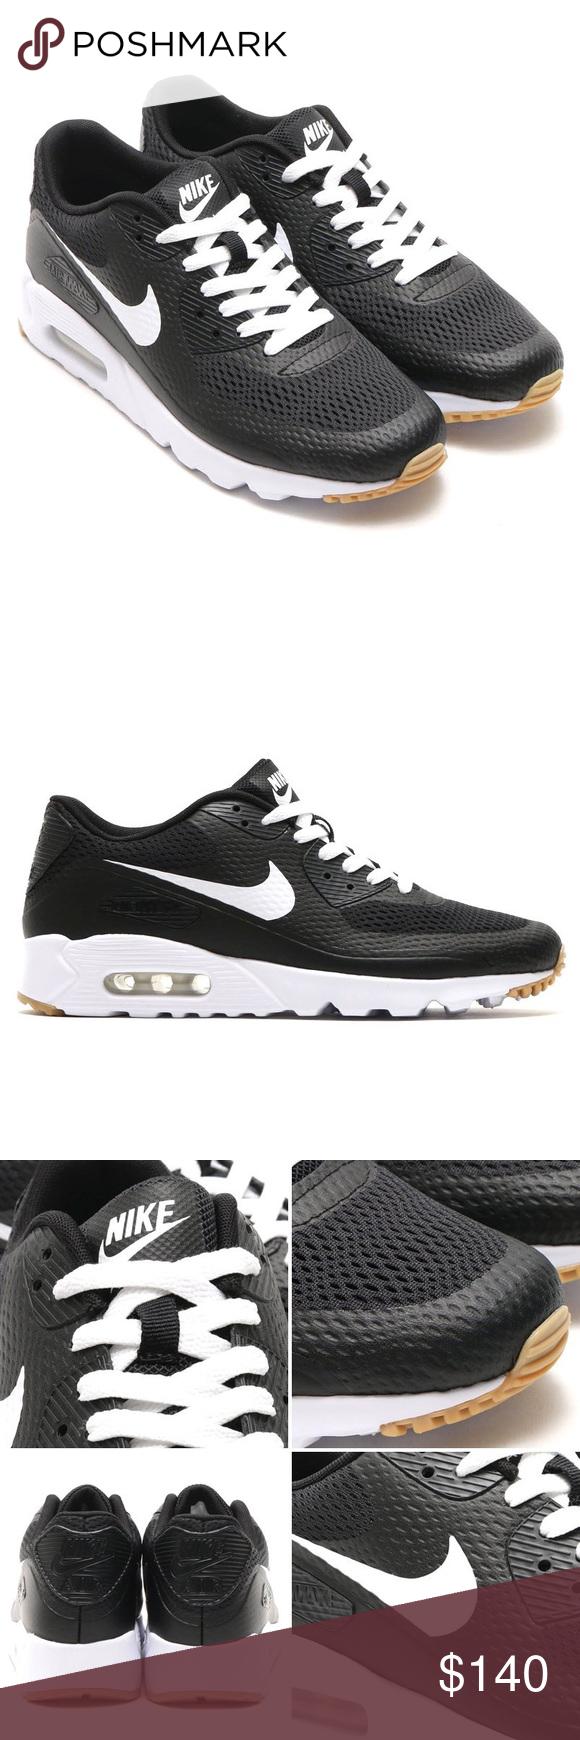 Nike air max 90 ultra essential black white Brand new